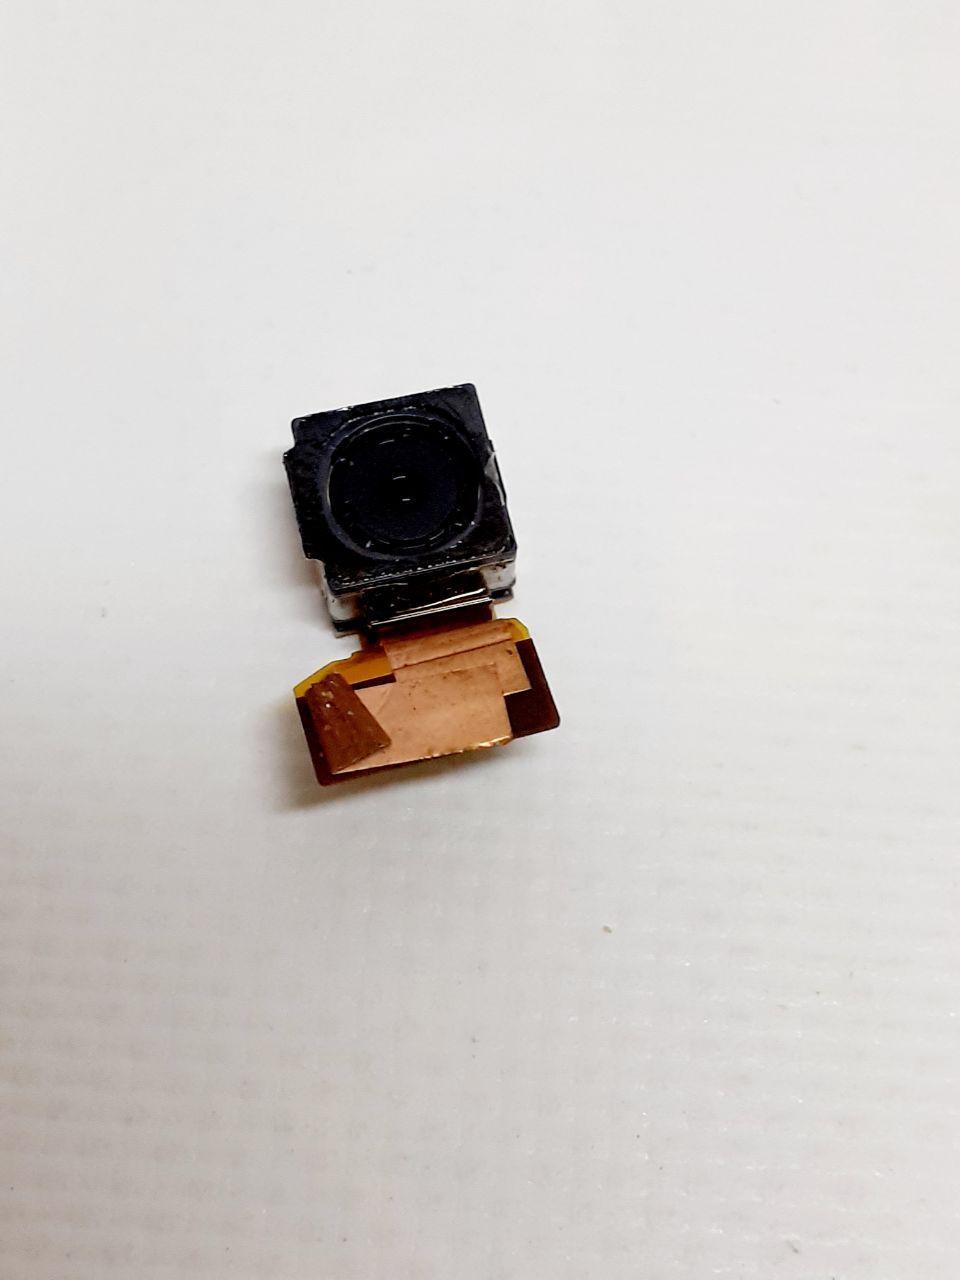 Камера для Sony C6602 L36h Xperia Z, C6603 L36i Xperia Z, C6606 L36a Xperia Z оригинал б.у.